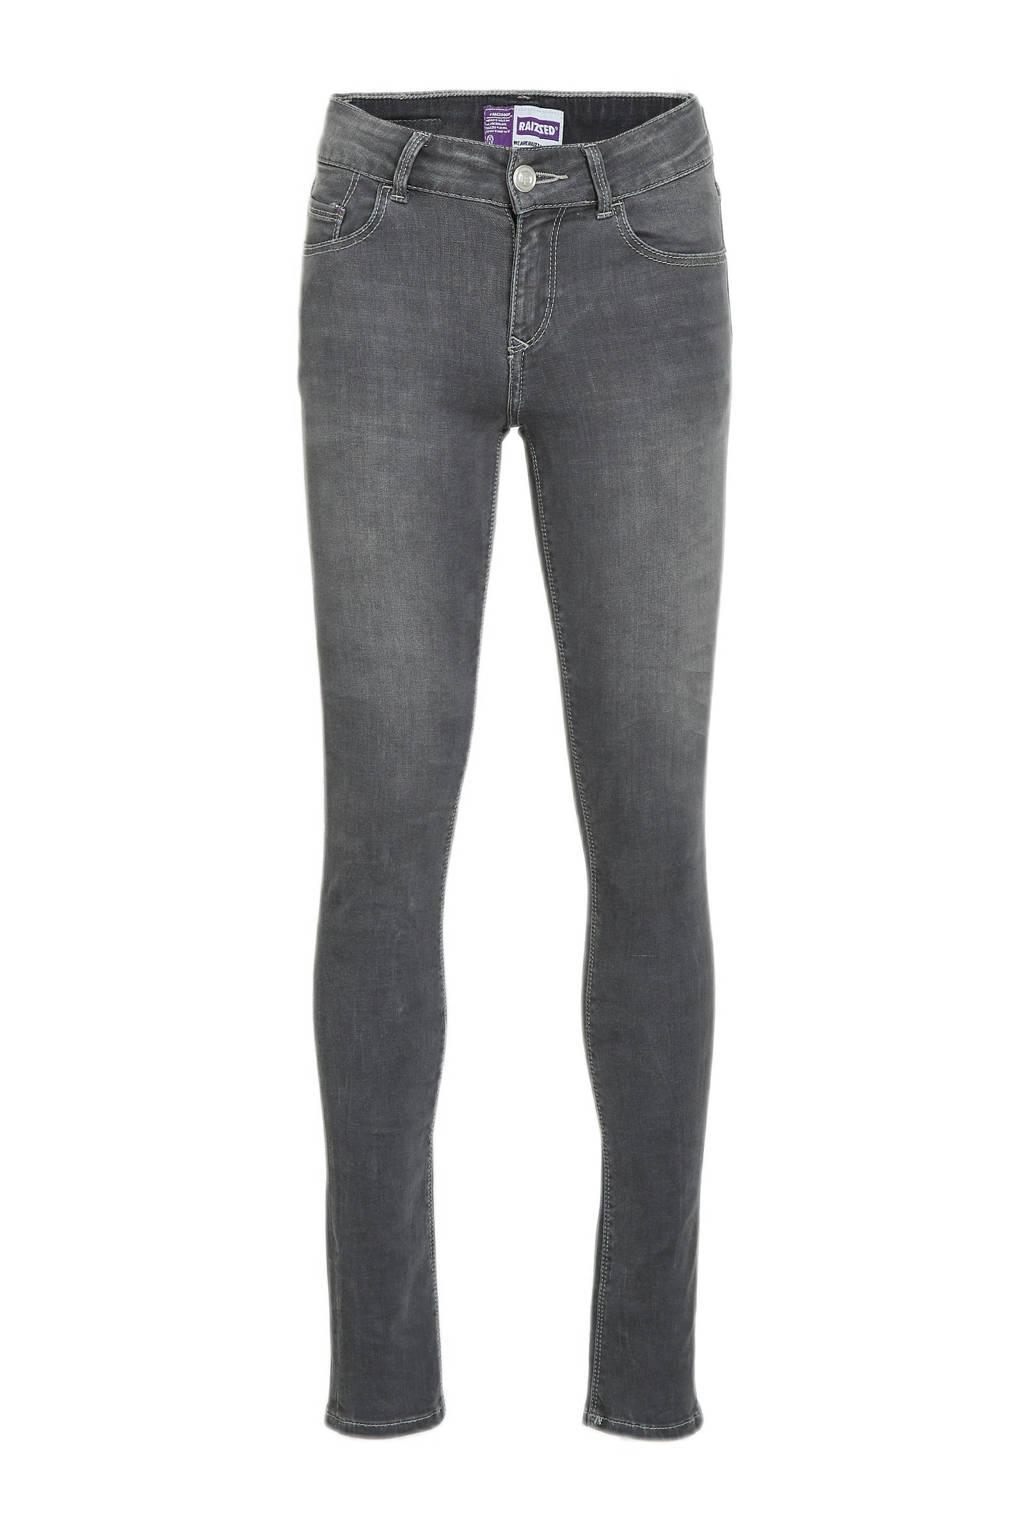 Raizzed super skinny jeans Chelsea mid grey stone, Mid grey stone